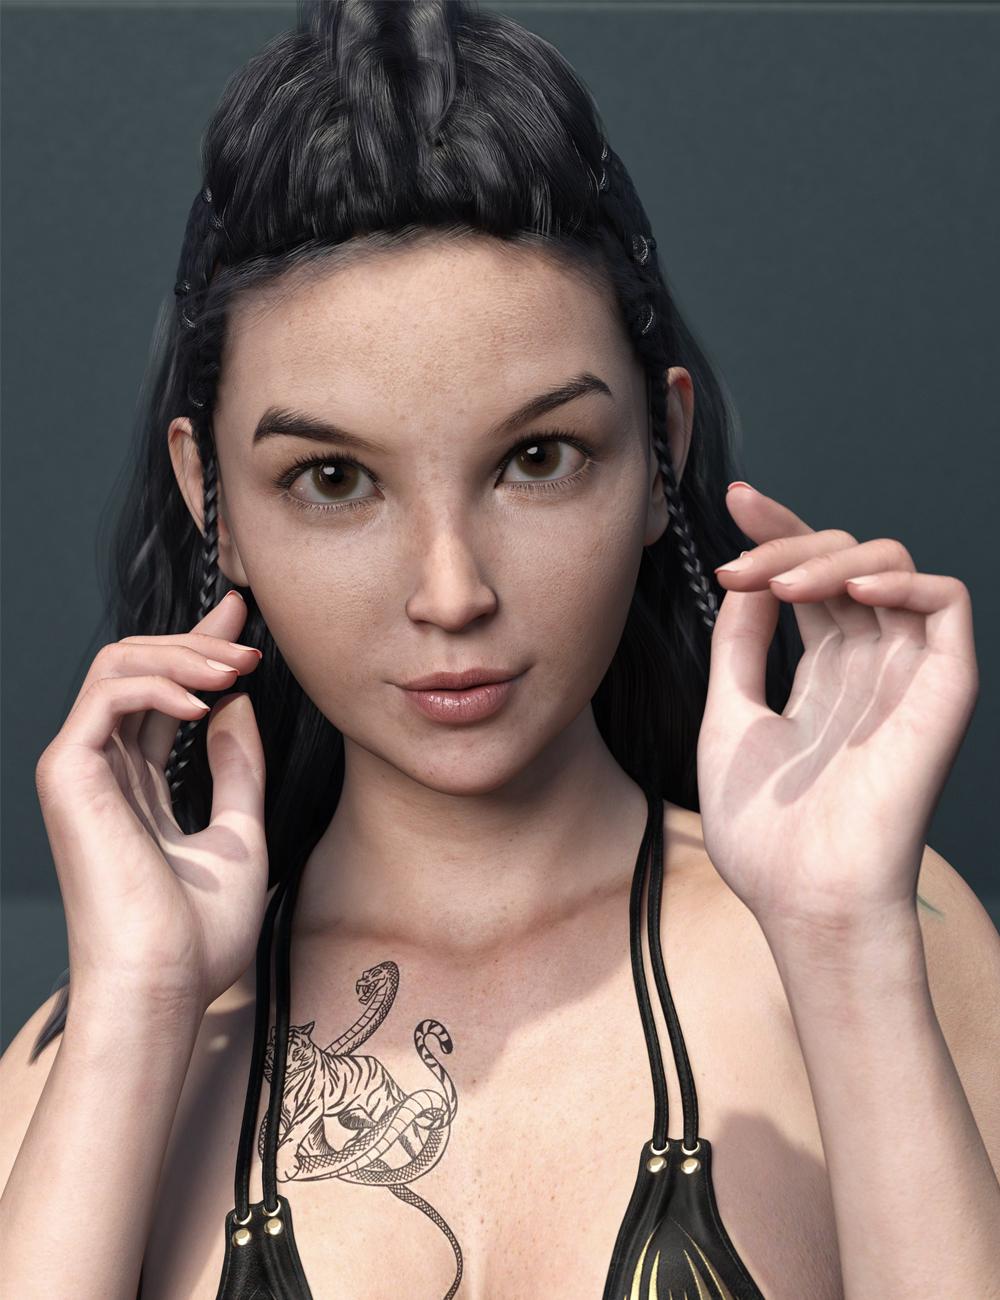 MR Gal for Genesis 8.1 Female by: Marcius, 3D Models by Daz 3D